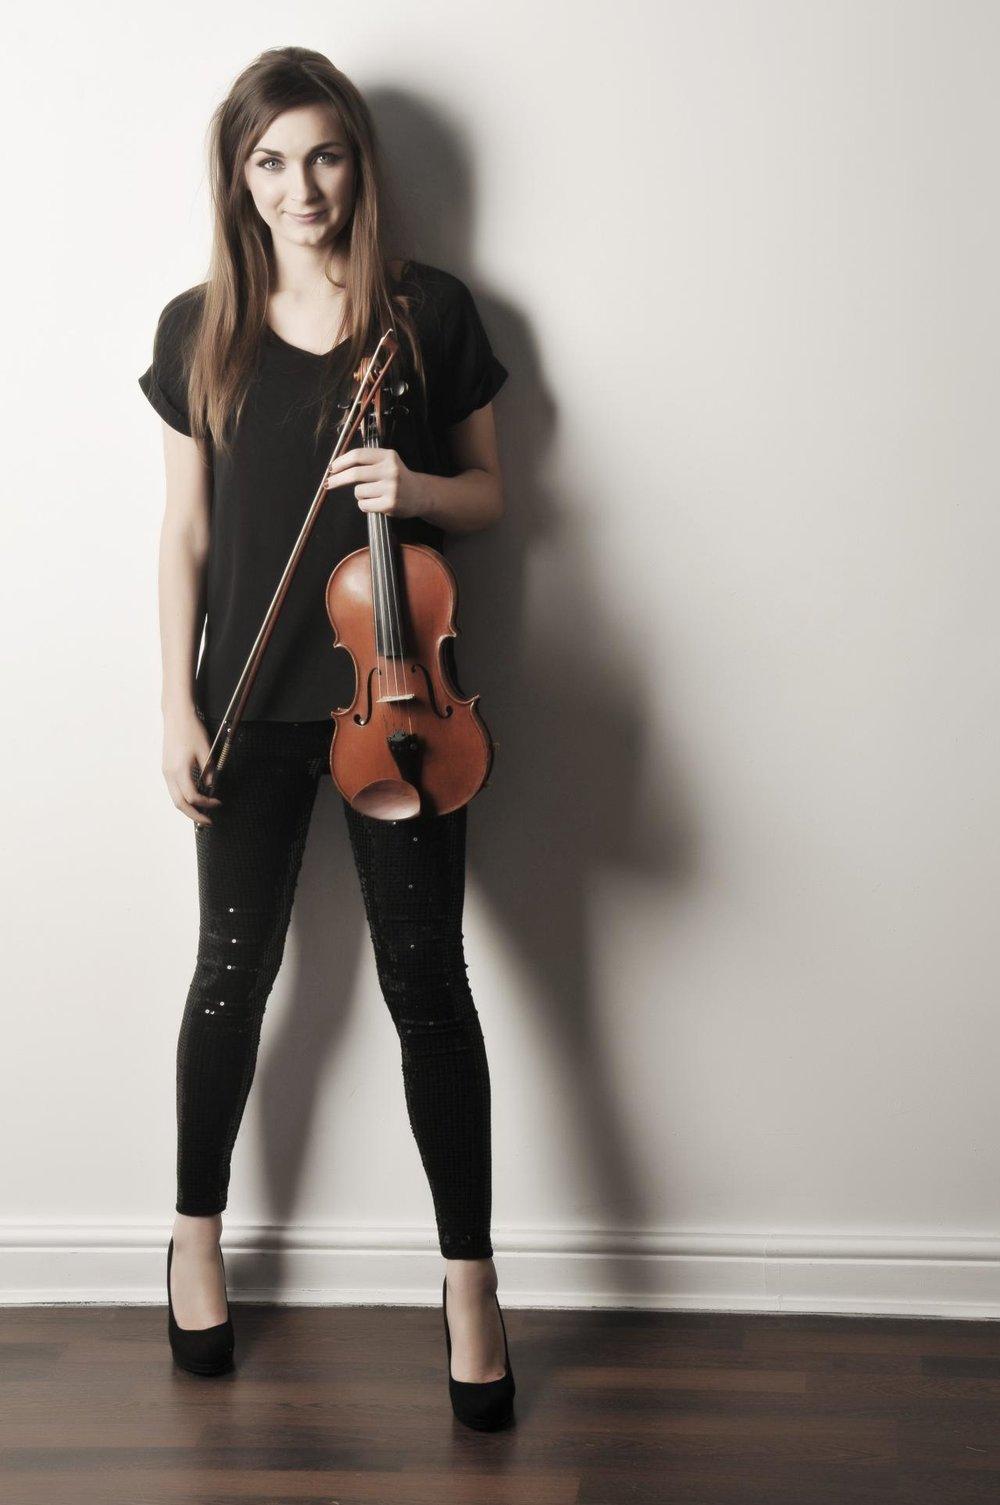 claire victoria violin.jpg